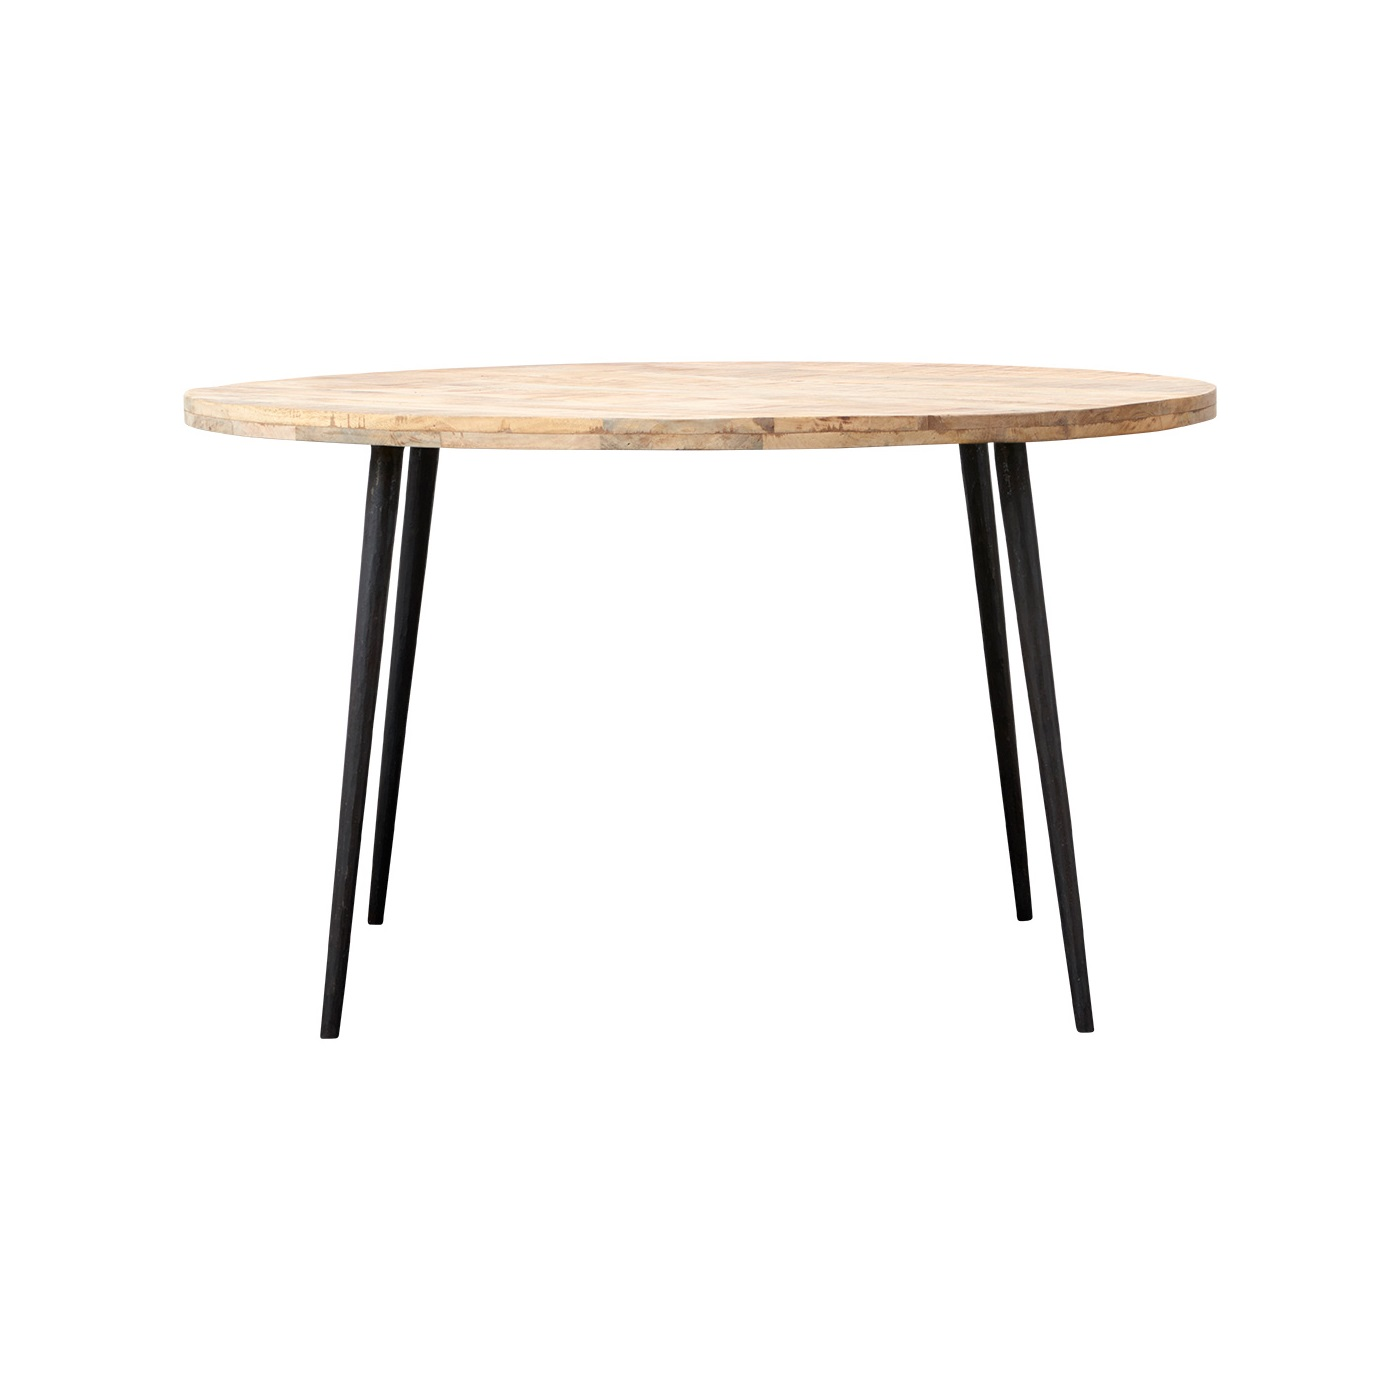 Runt matbord CLUBE Ø 130 cm ljus, House Doctor